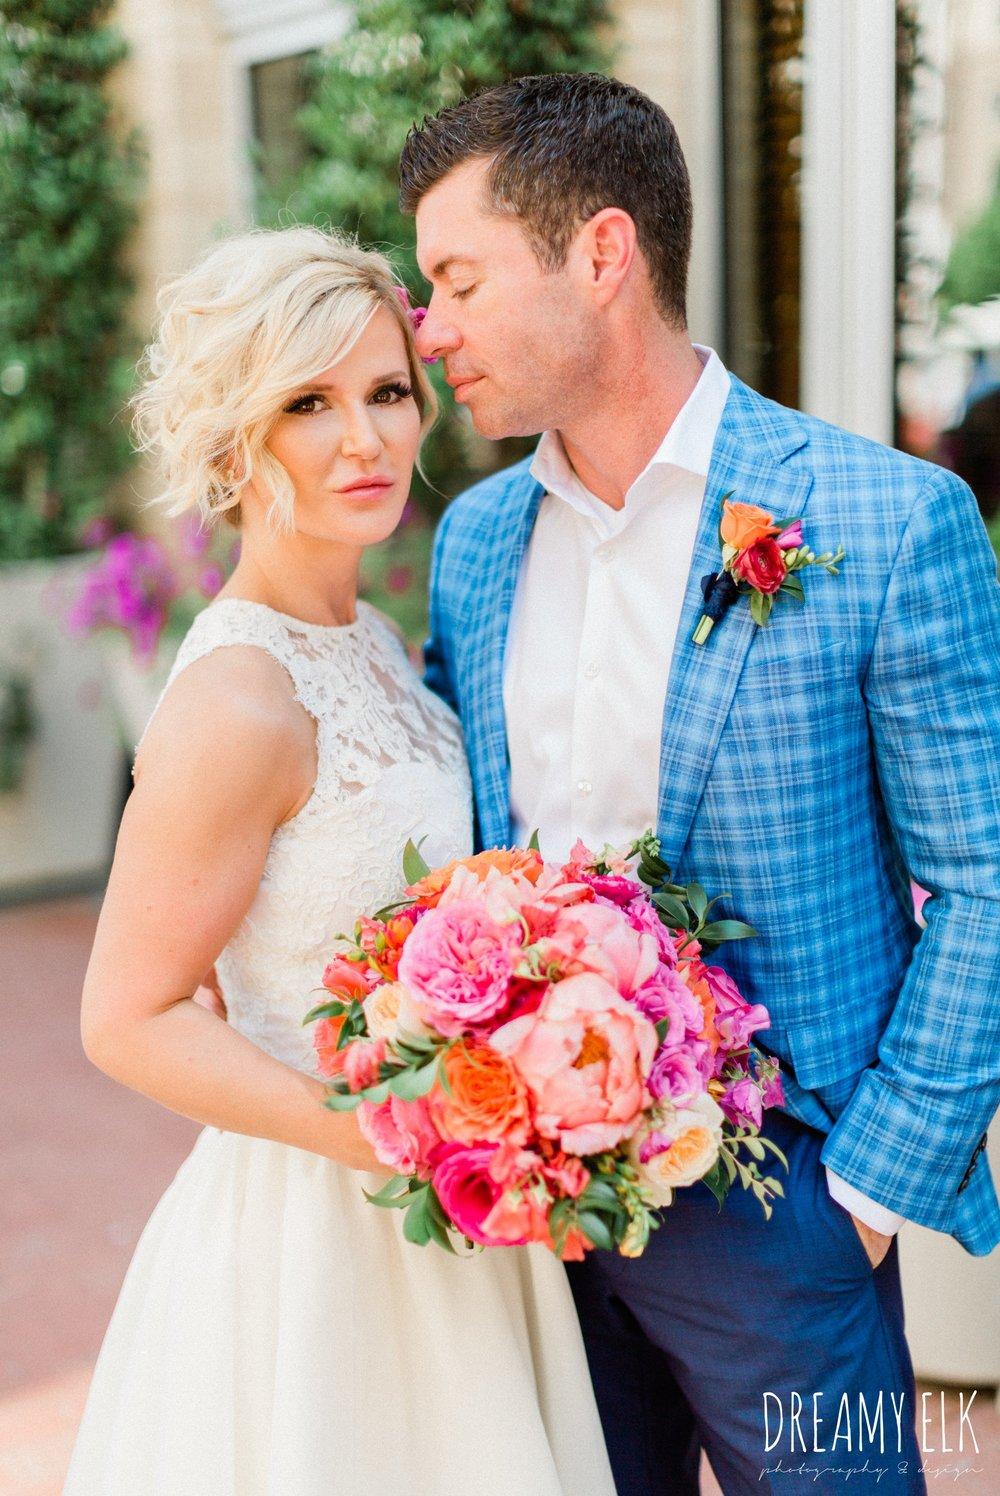 groom, ted baker, bride, michael faircloth, short wedding dress, spring colorful pink orange wedding photo, fort worth, texas, dreamy elk photography and design, jen rios weddings, kate foley designs